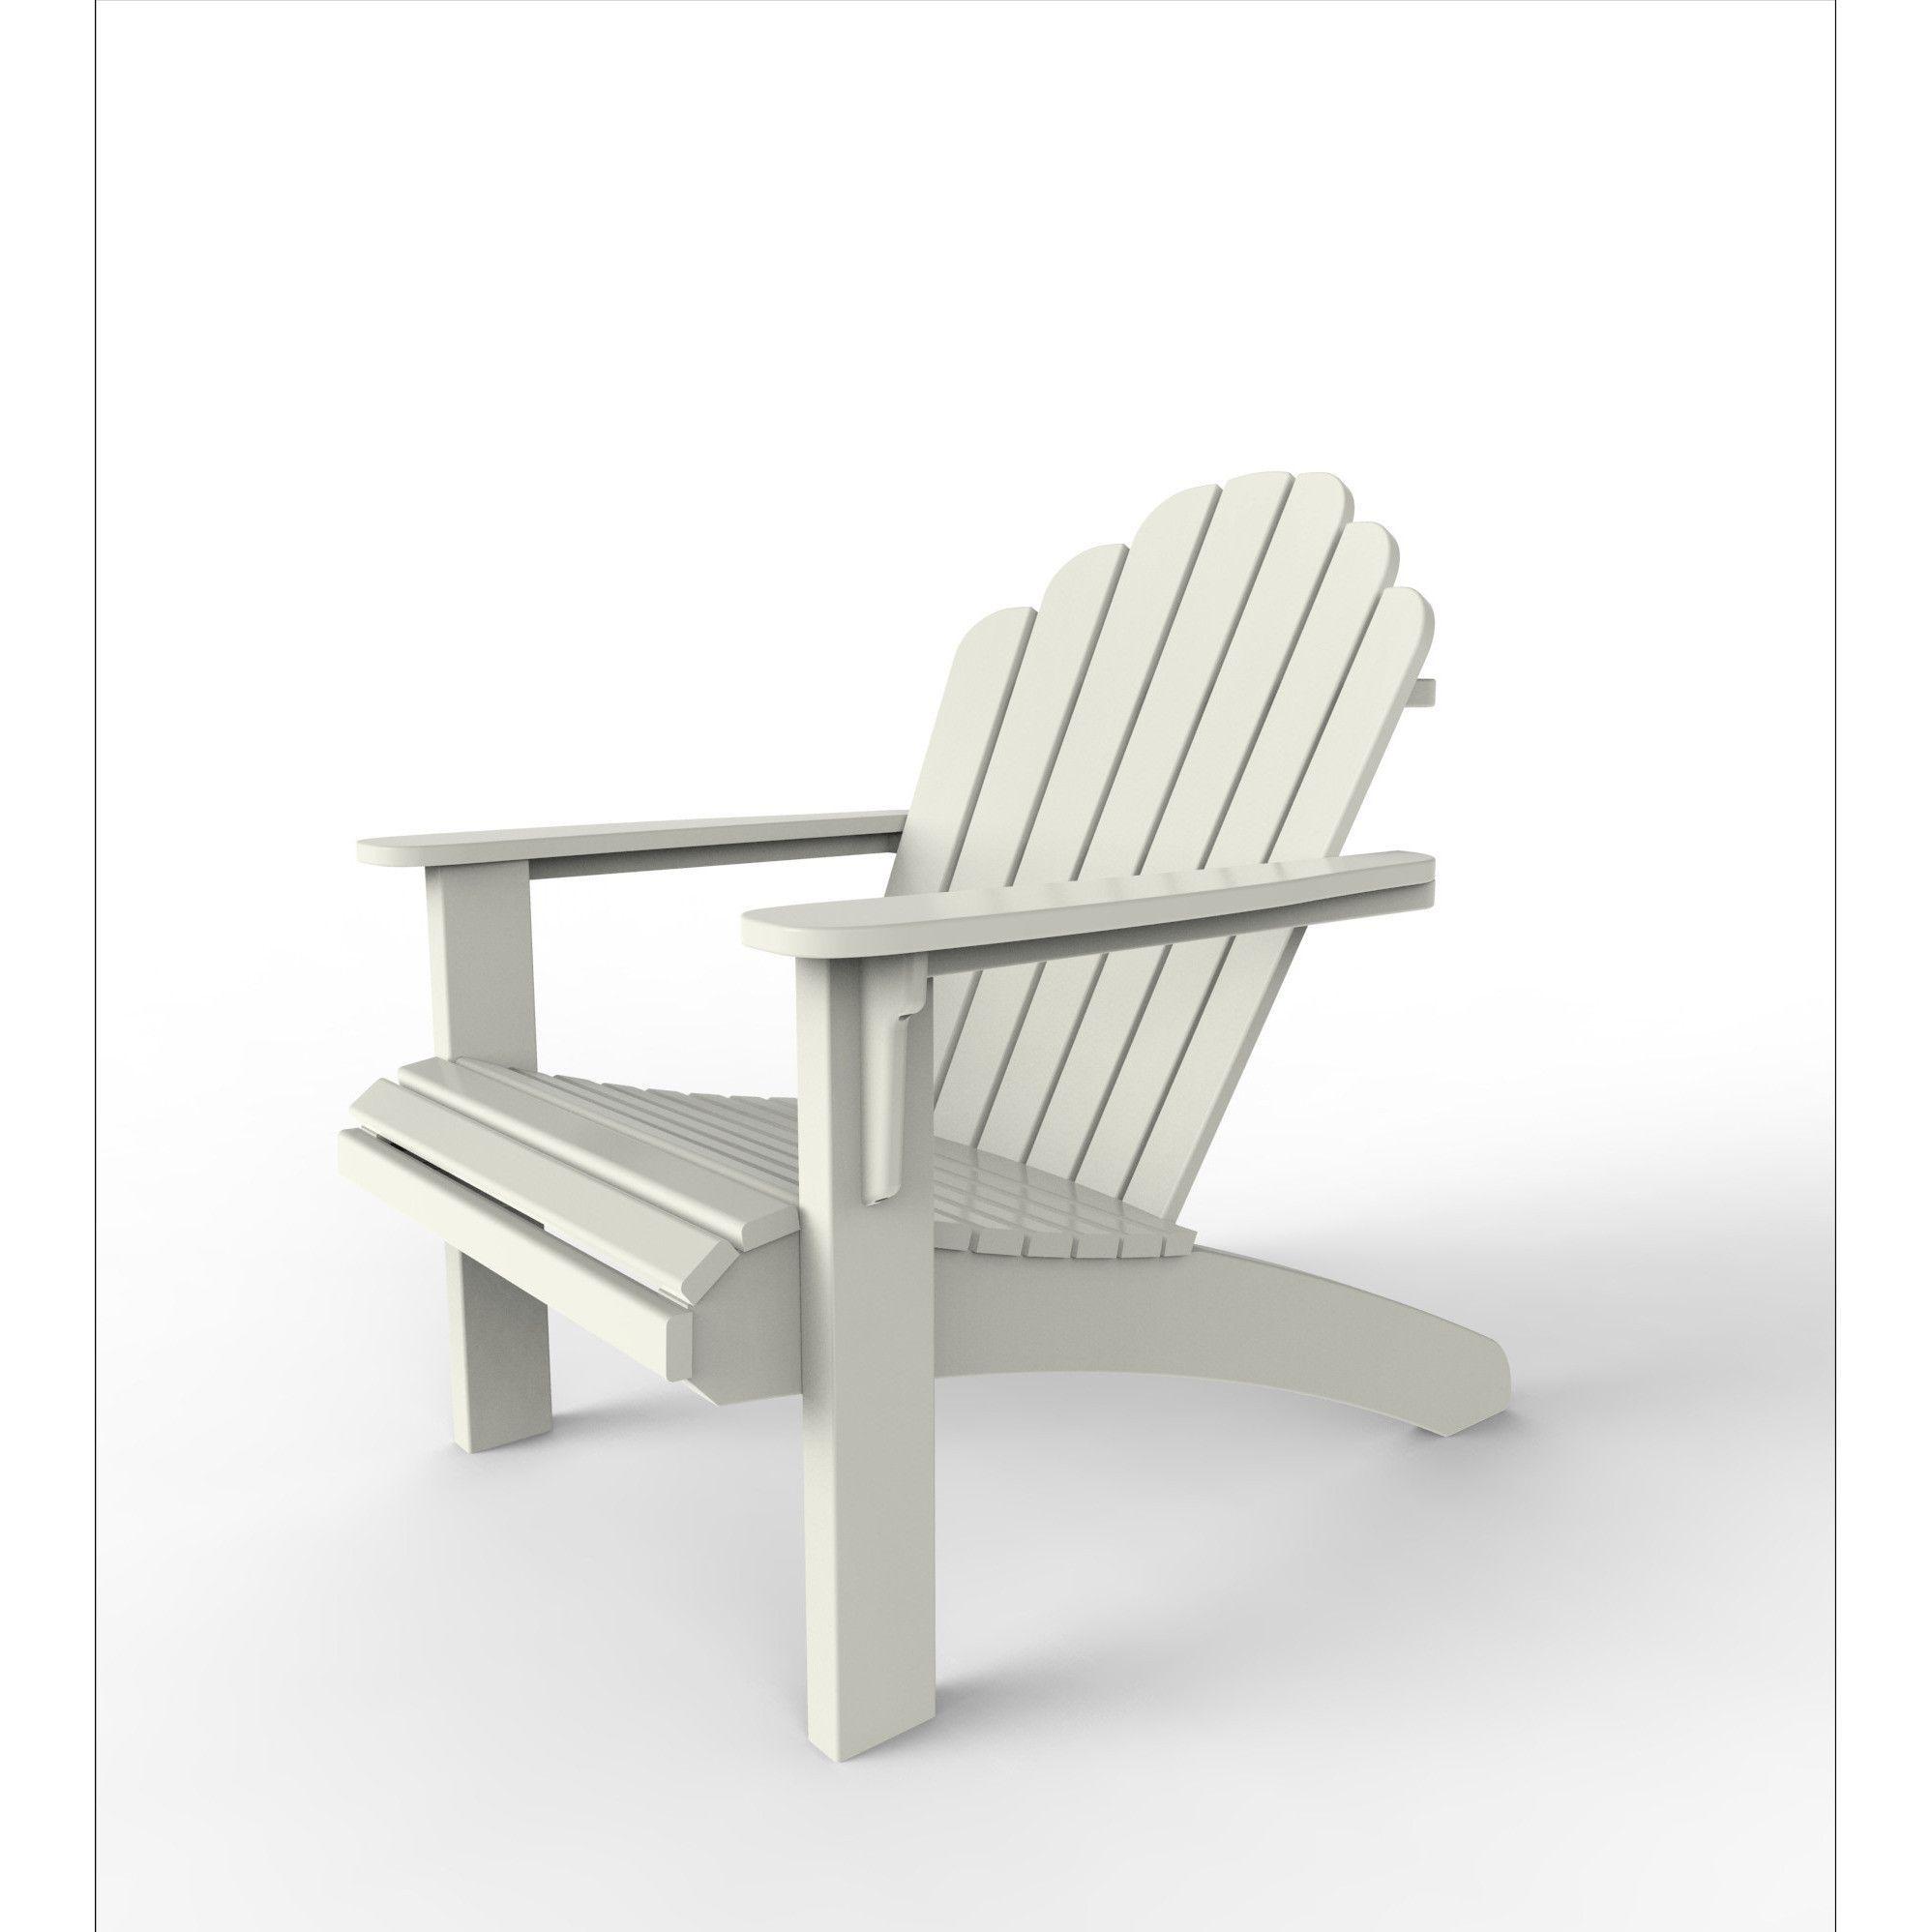 Cool-Living Adirondack Chair White